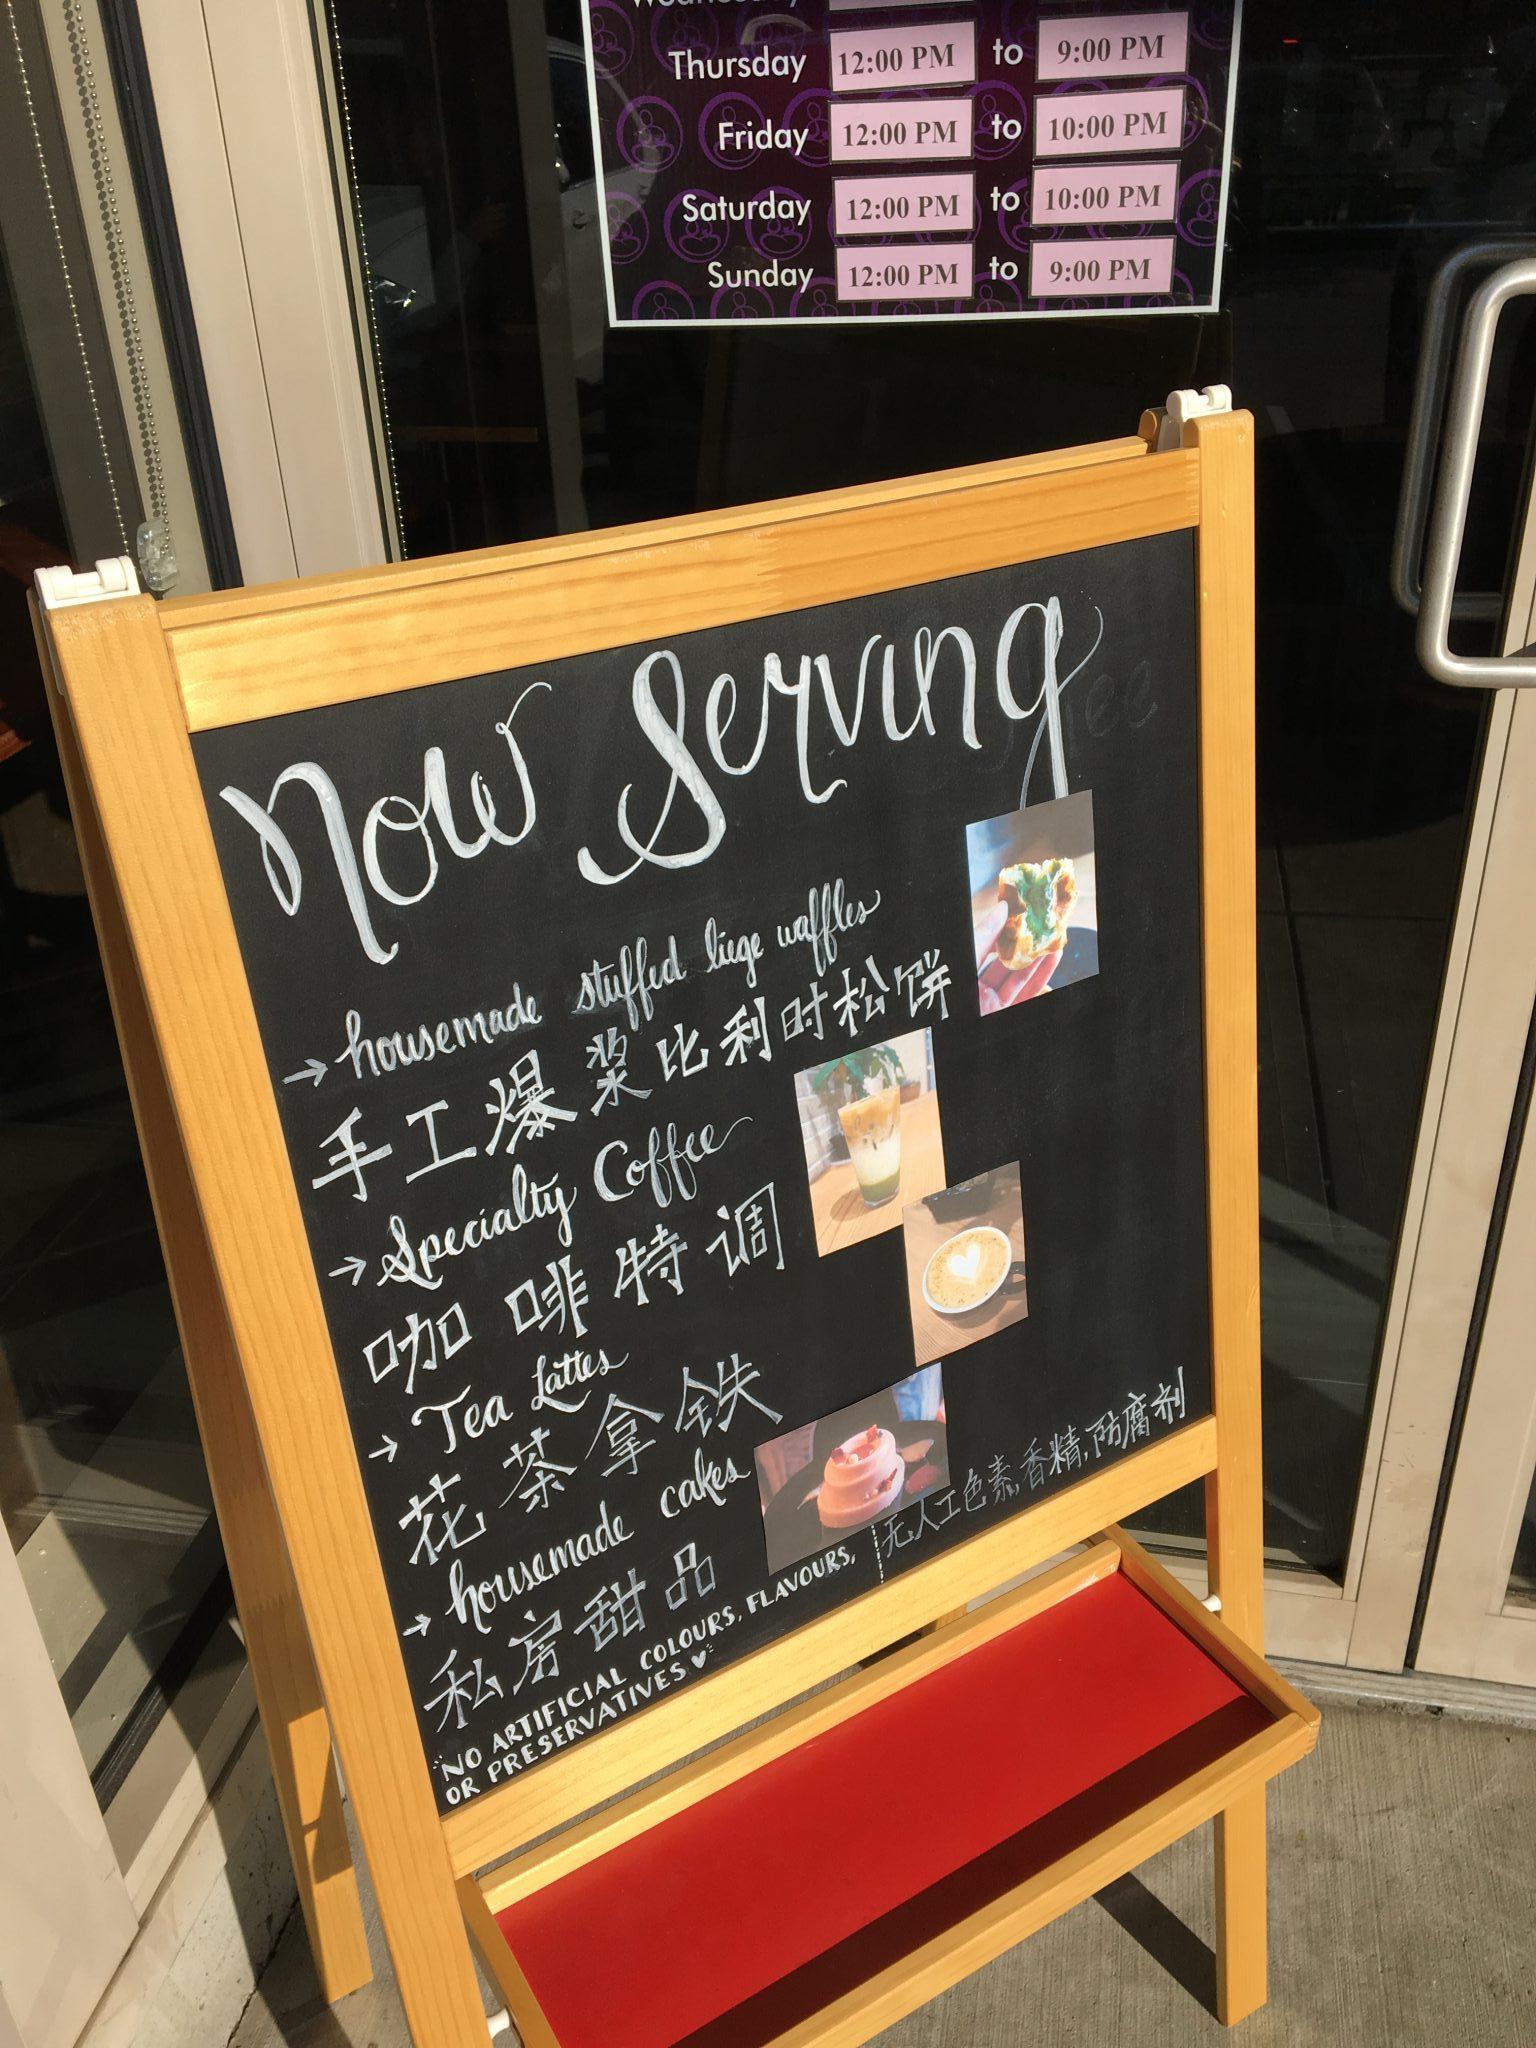 There Are 2 Coffee Shops In Union Square, Zen Stone